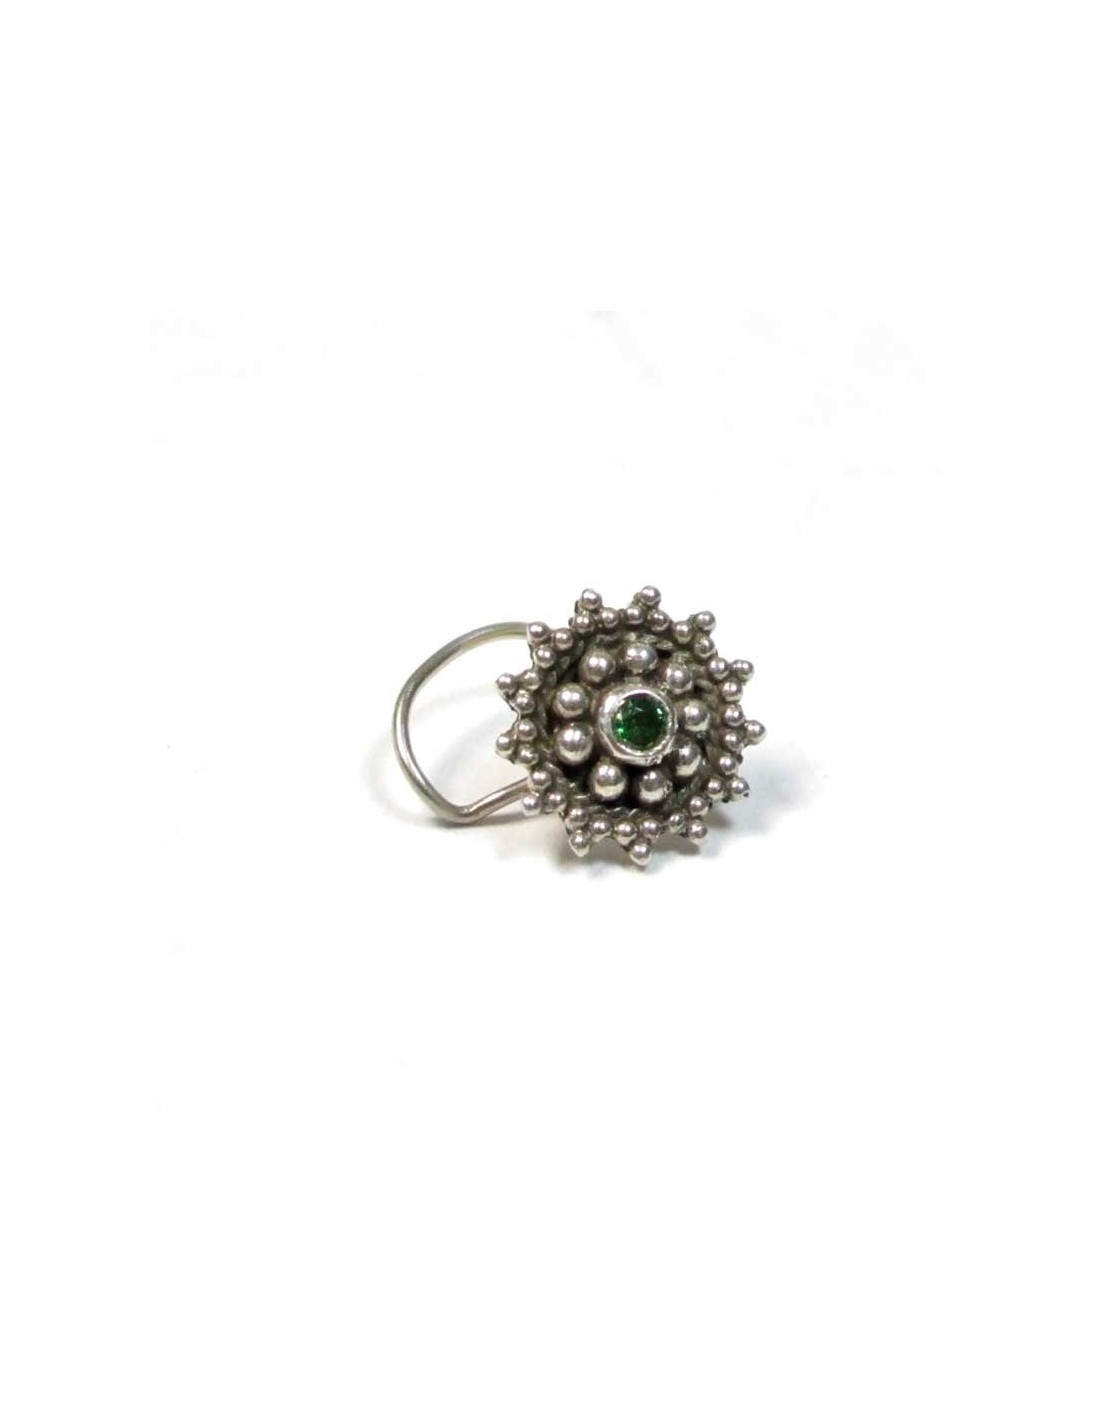 piercing de nez cisel piercing indiens co42. Black Bedroom Furniture Sets. Home Design Ideas